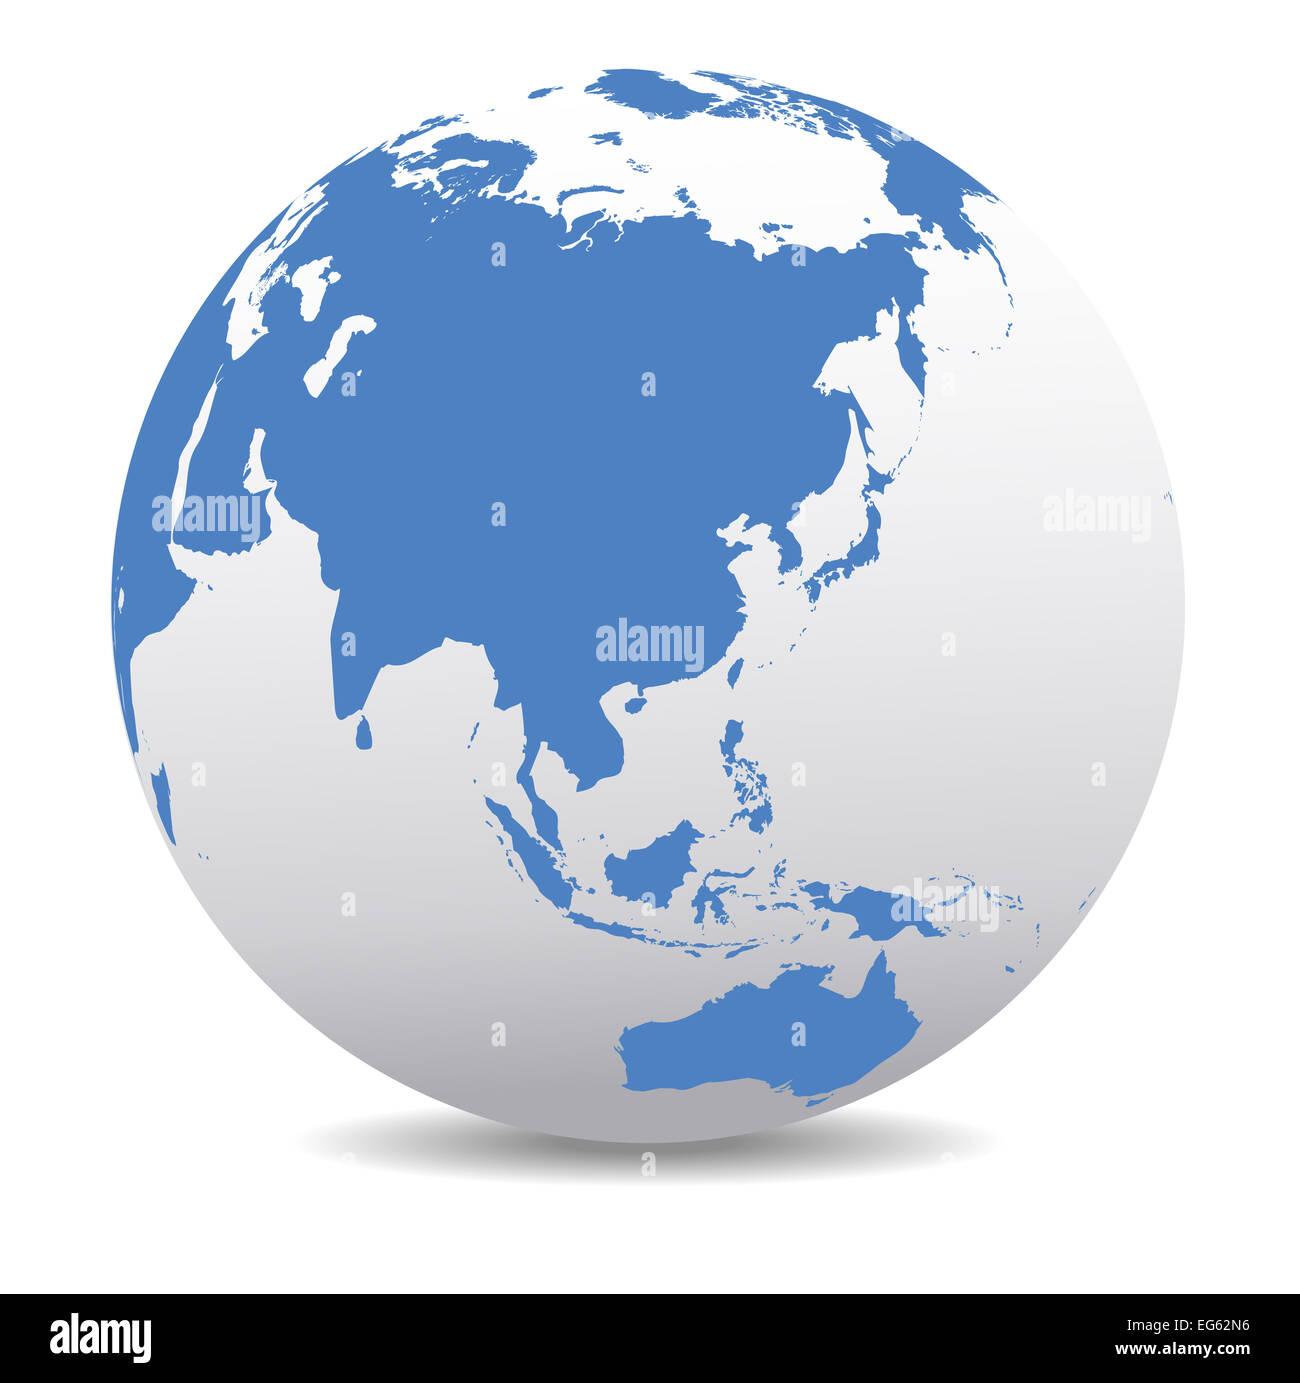 China, Japan, Malaysia, Thailand, Indonesia, Global World ... on china kyrgyzstan map, china middle east map, china's south china sea map, china kunlun mountains map, china iran map, china pacific ocean map, china poland map, china republic map, china macau map, china silk road map, tibetan plateau china map, china countries map, china bangladesh map, china greenland map, china new zealand map, china turkey map, china terracotta warriors map, china and indonesia, china fiji map, china to hong kong map,